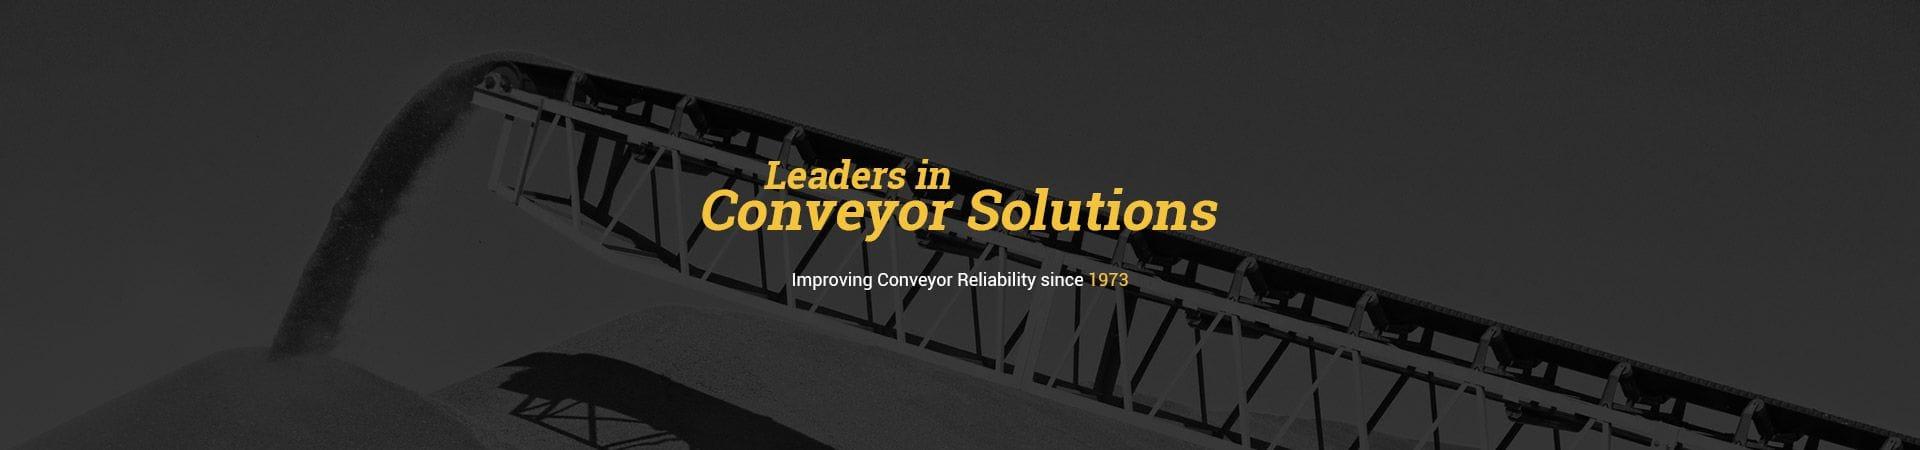 Reliable Conveyor Belt | Leaders in Conveyor Solutions | Improving Conveyor Reliability since 1973